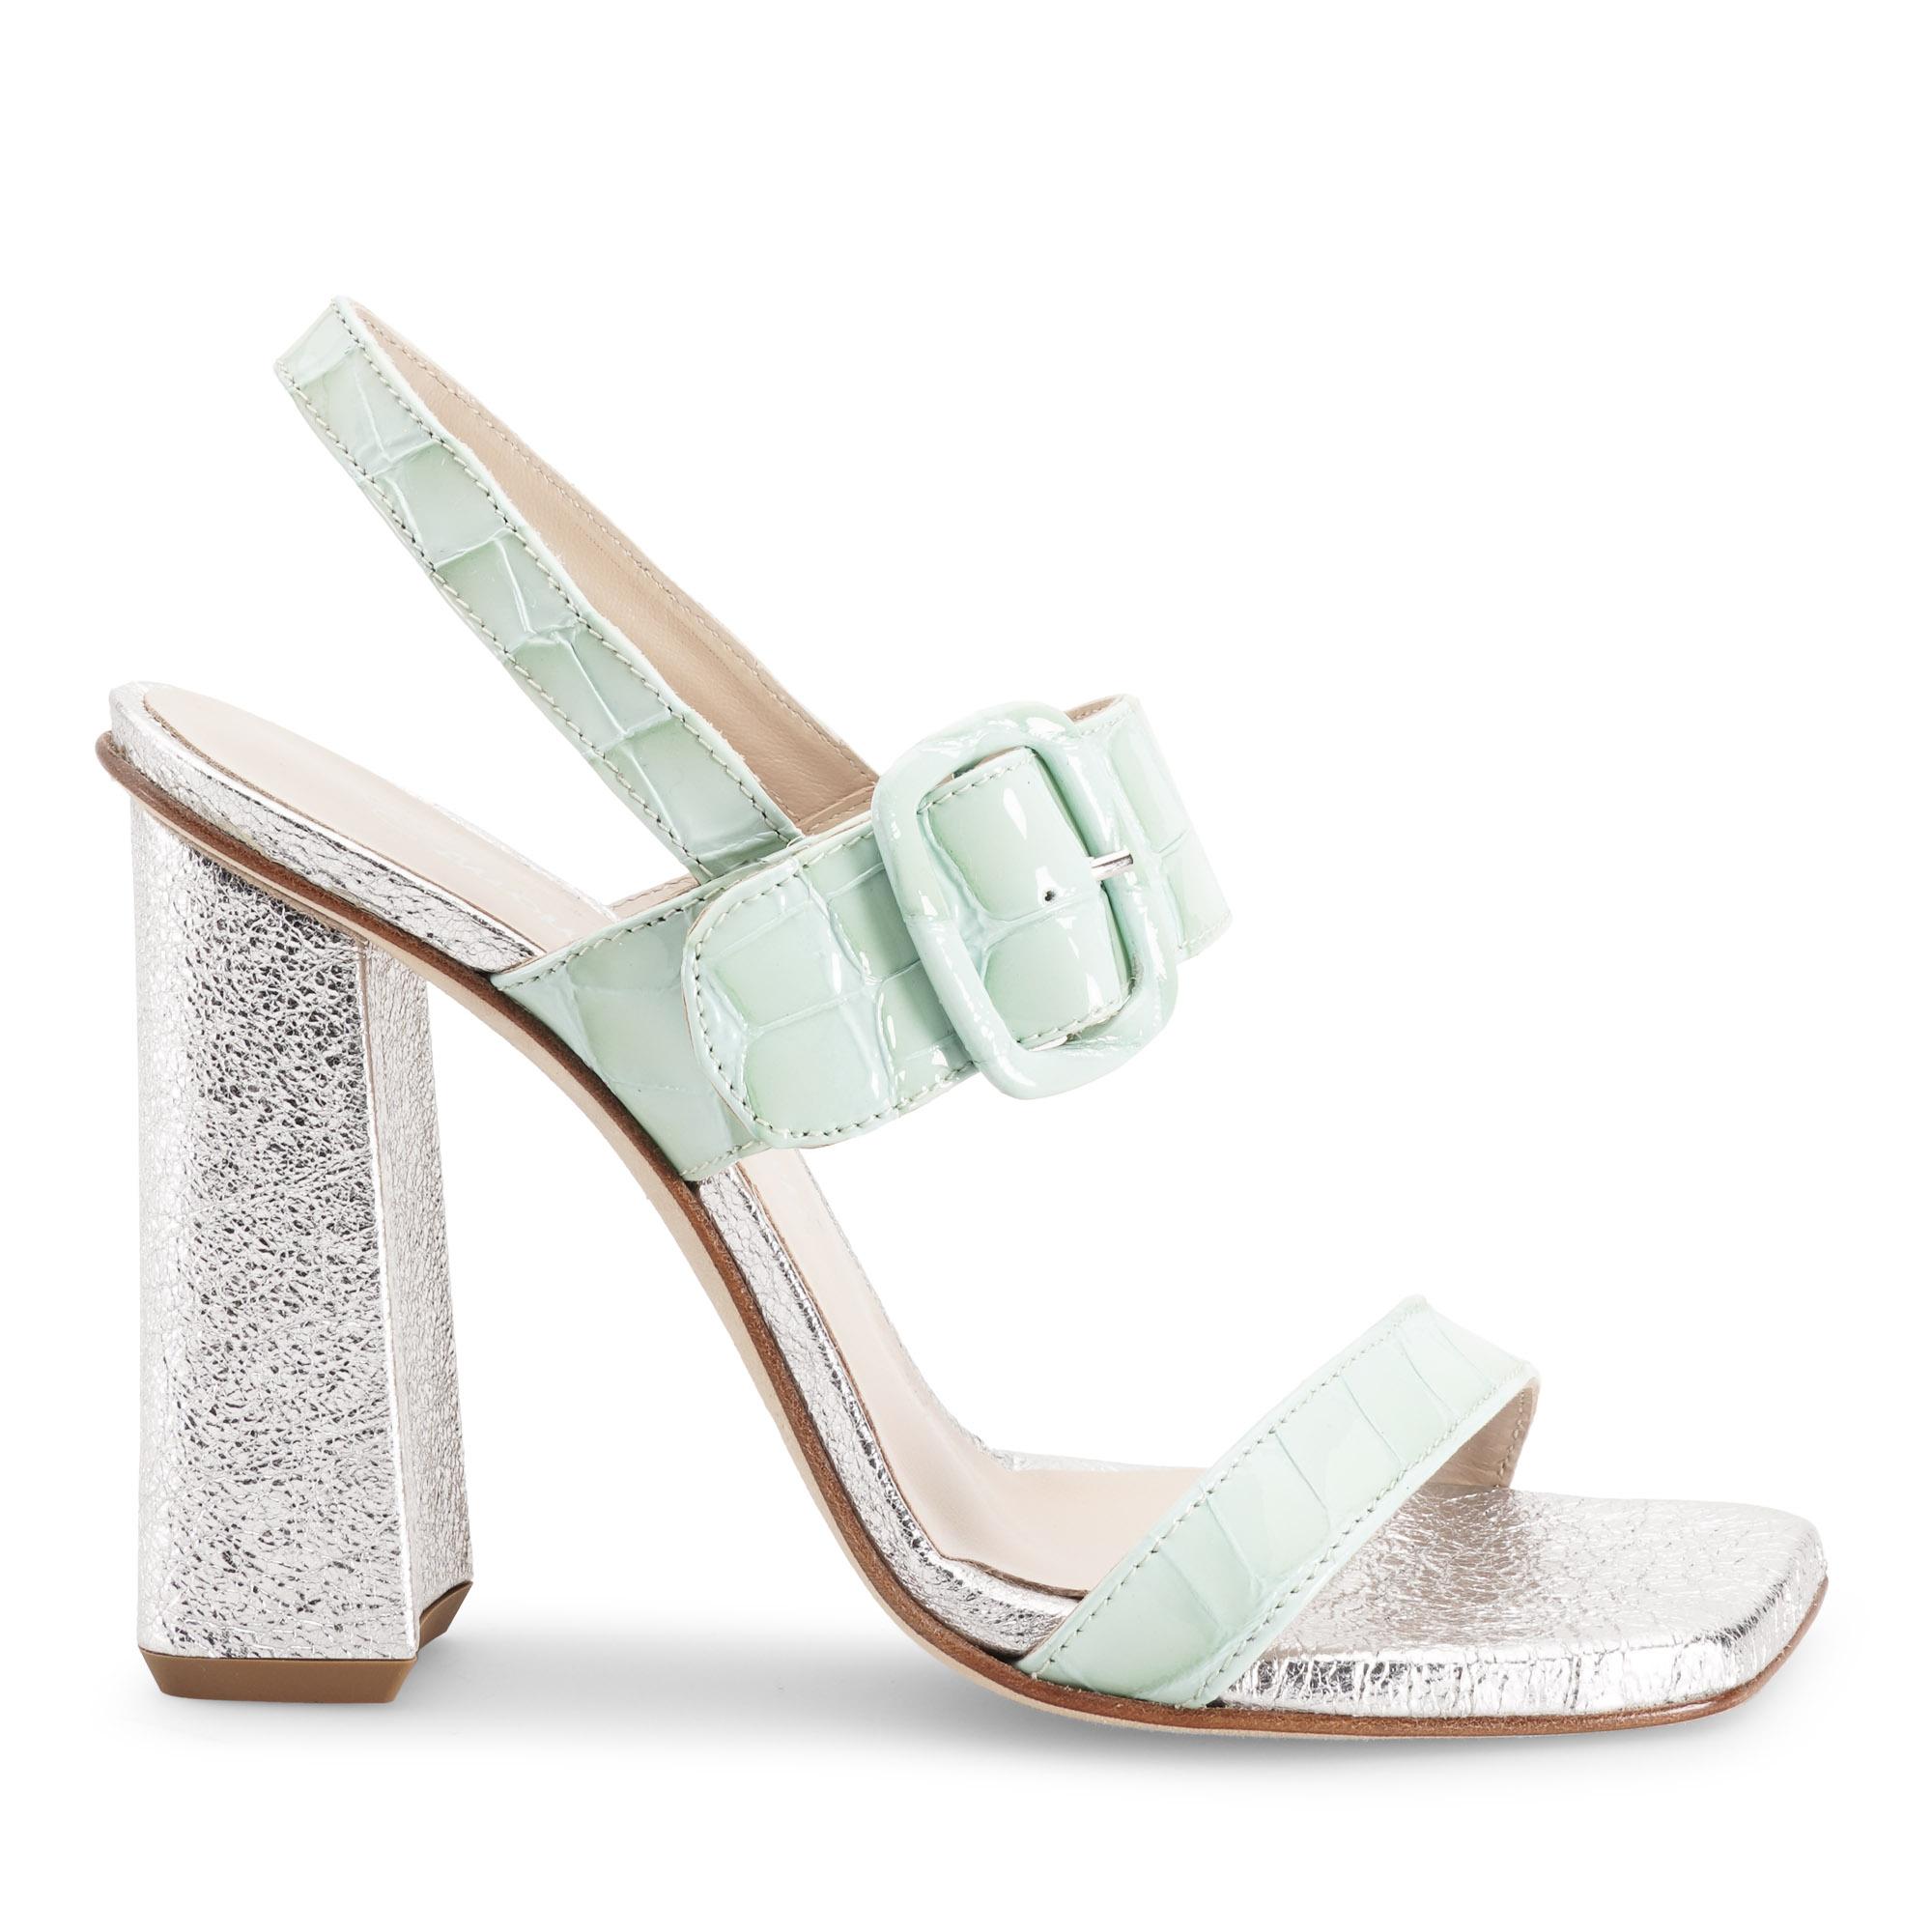 sandalo-donna-cocco-laminato-argento-tiffany-emanuela-passeri-heels-shoes-spring-summer-2021